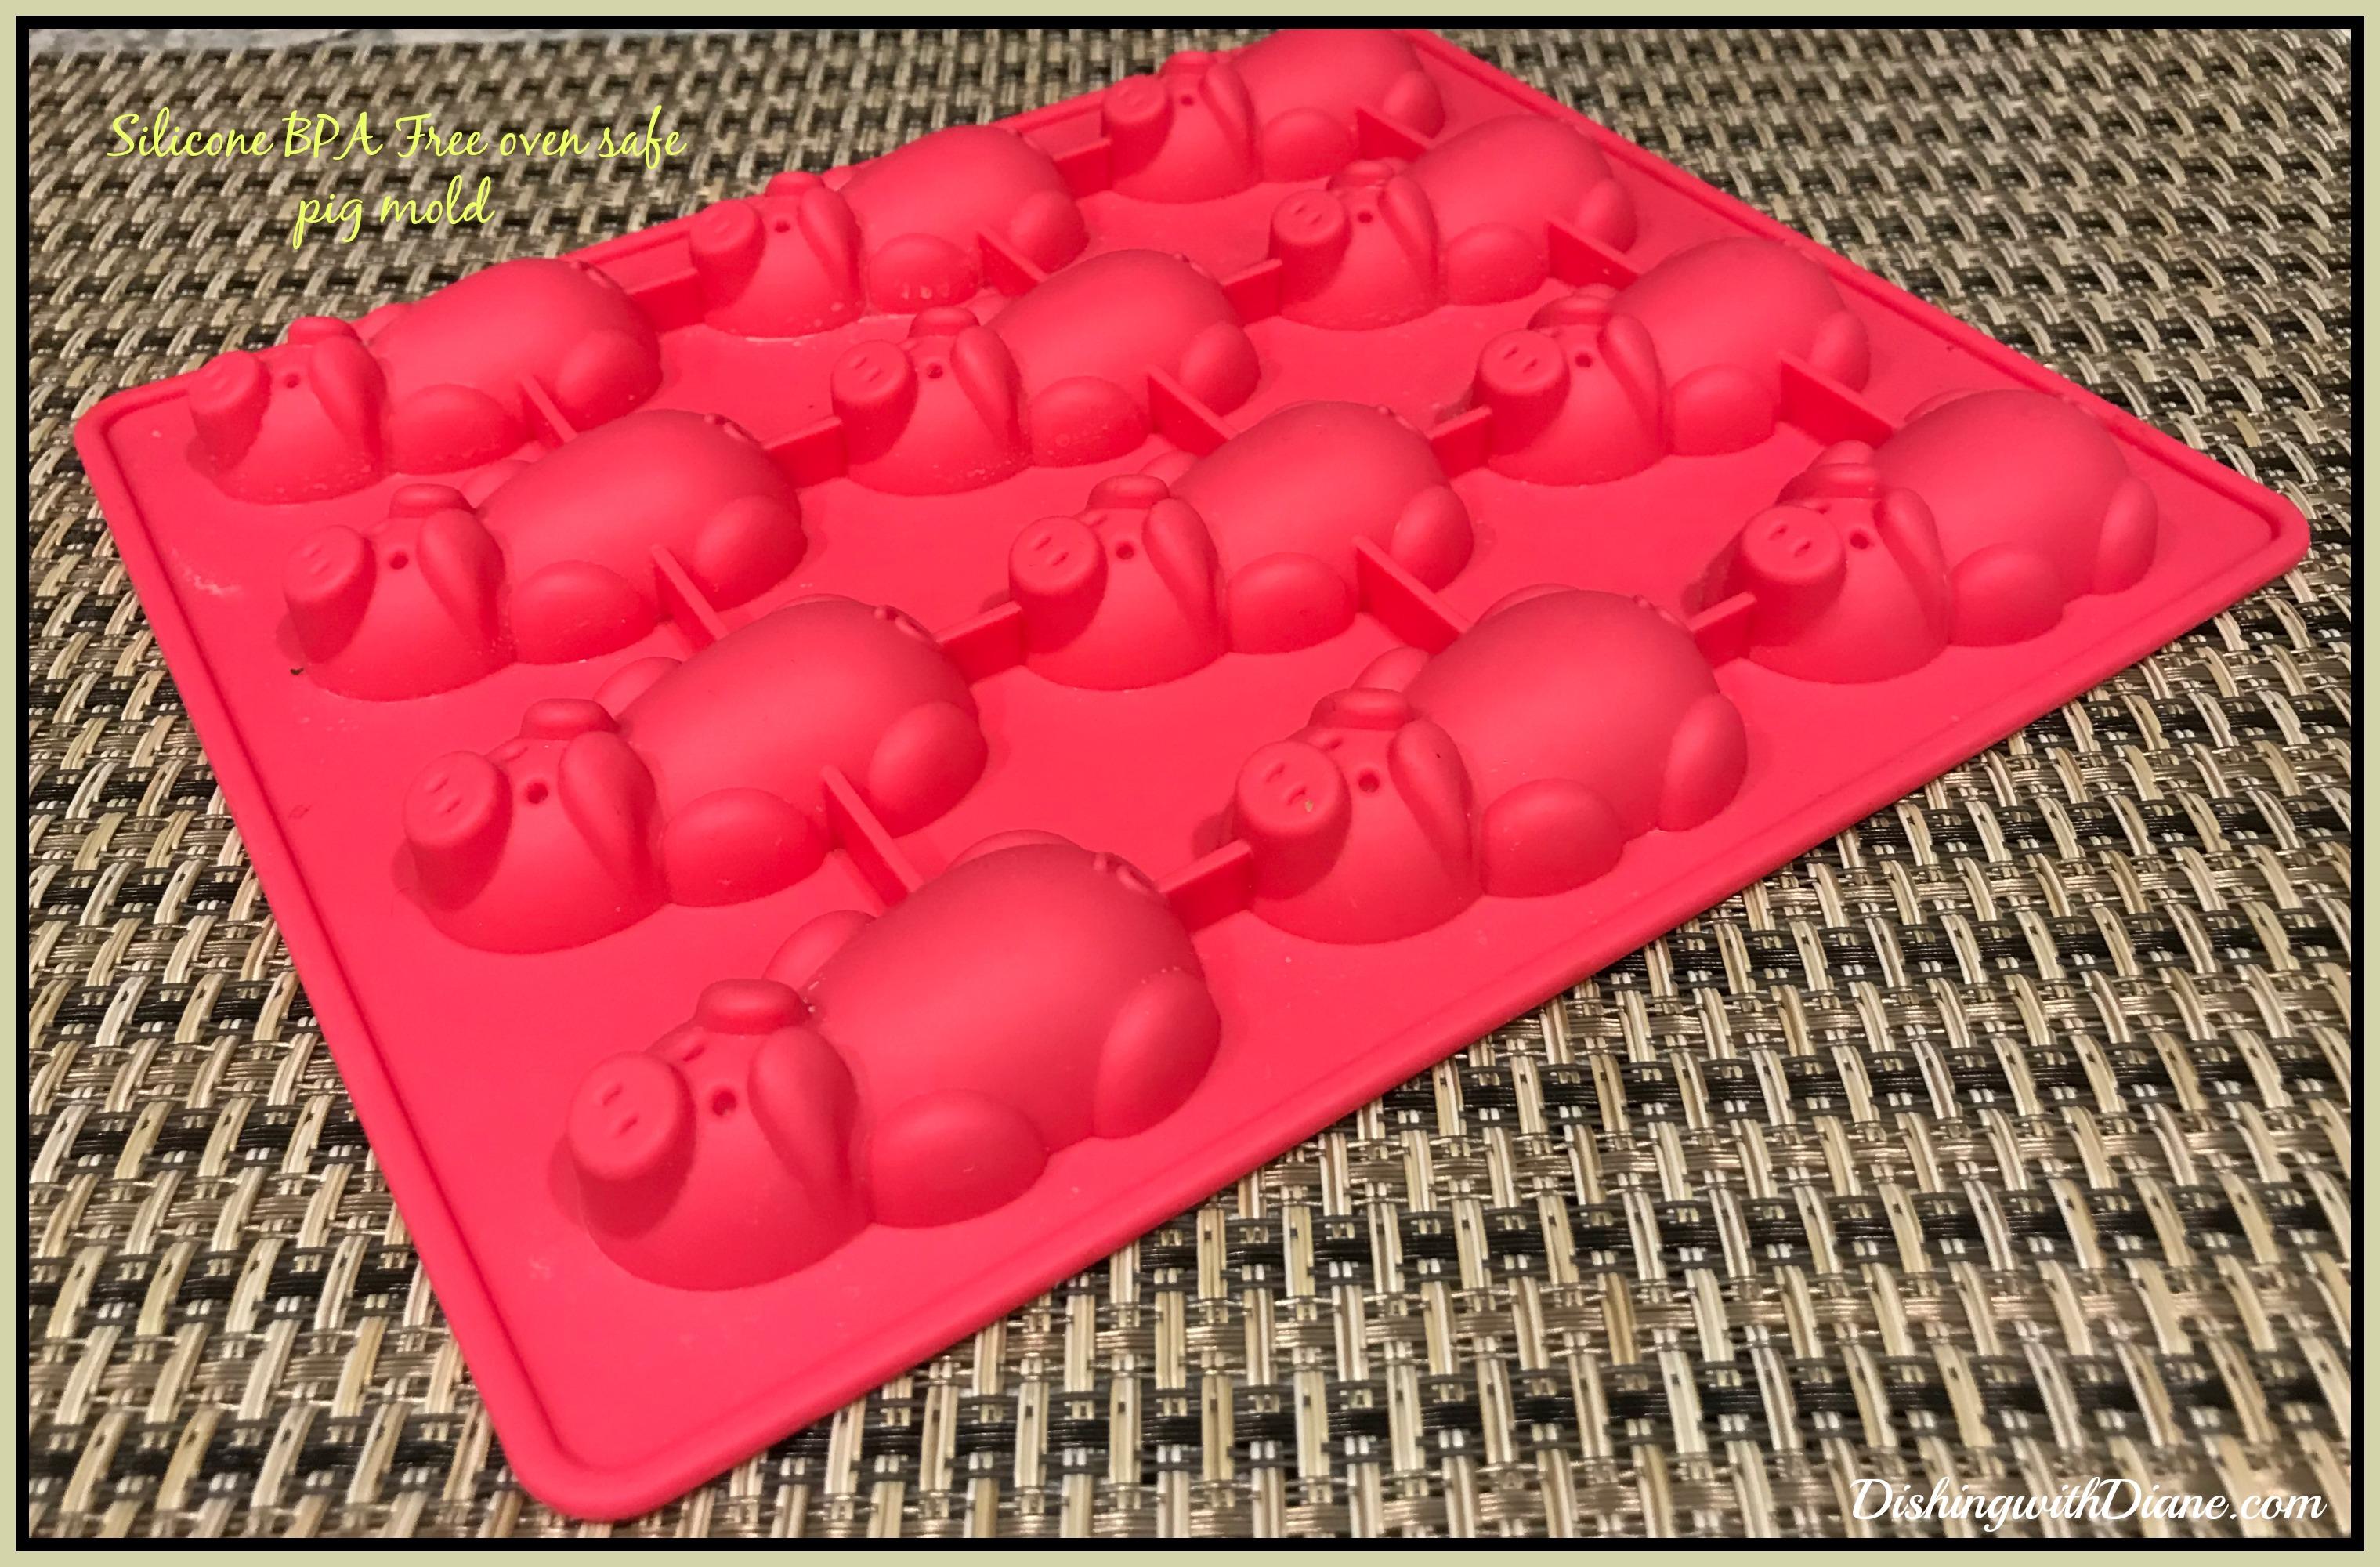 2019-08-20 00.46.13 PIG MOLD